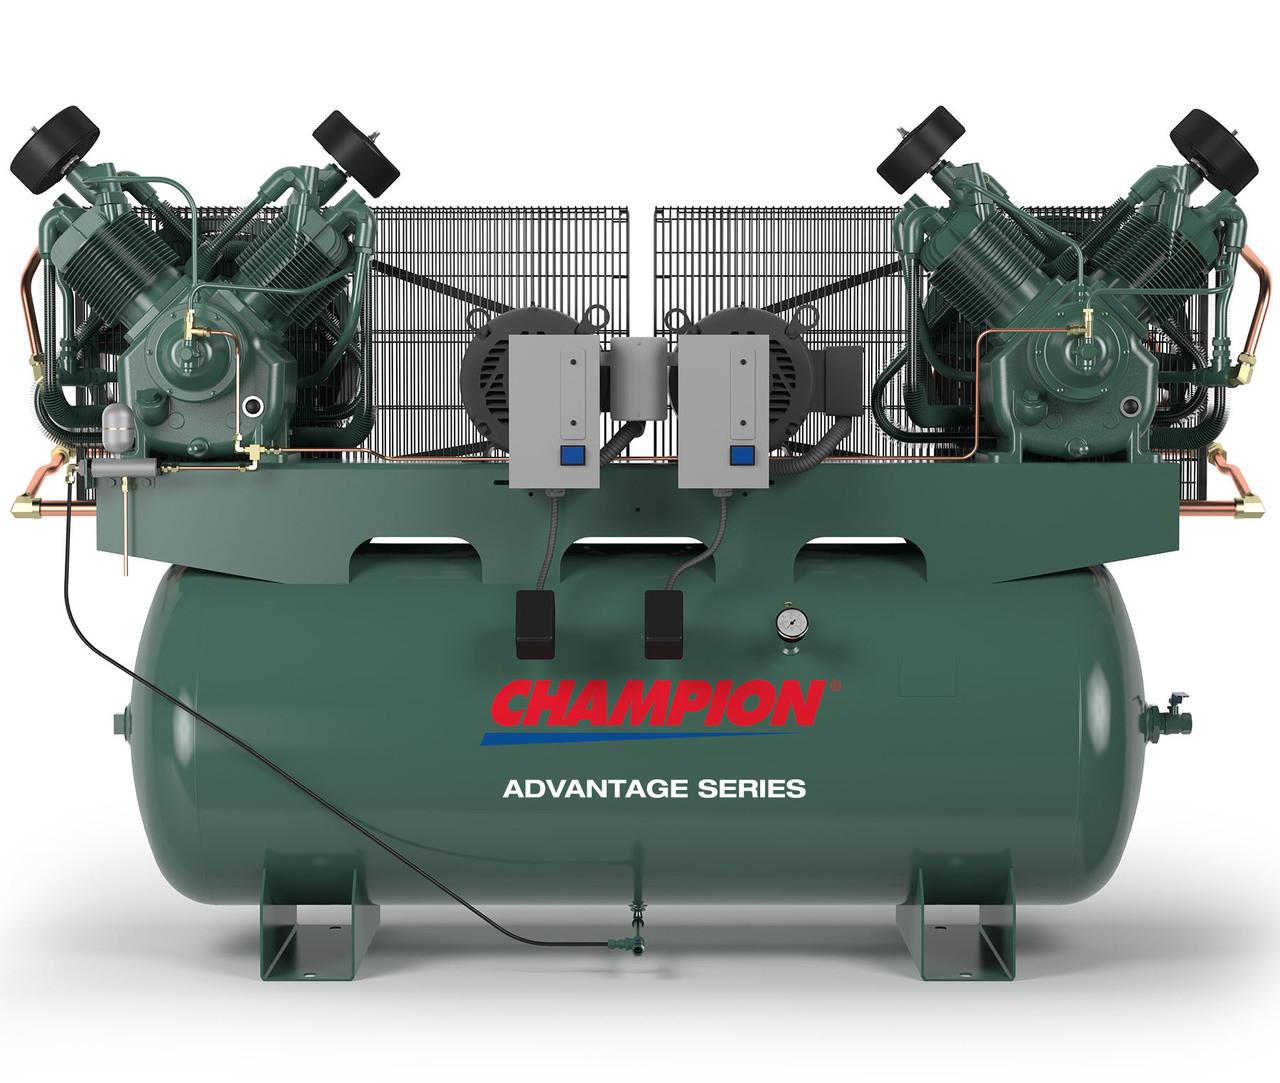 Champion HR7D-12ADV-3 3 PH Advantage Series Air Compressor